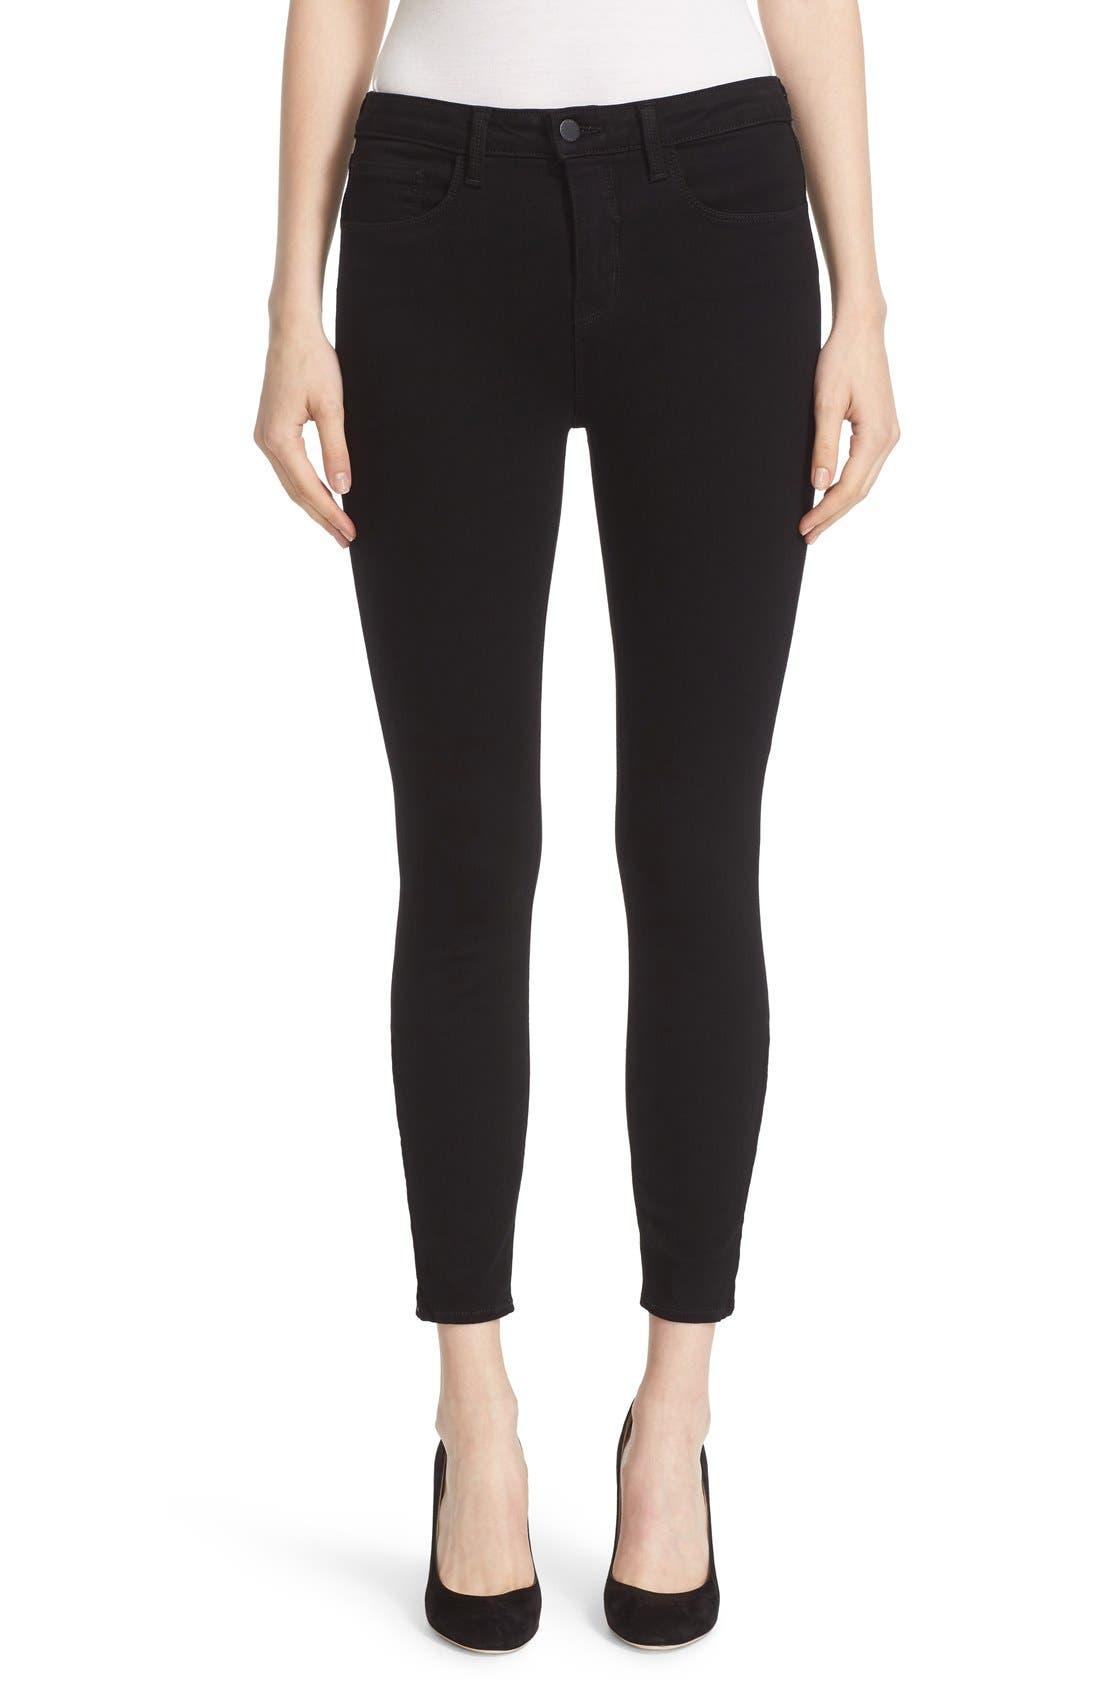 LAGENCE Andrea Ankle Zip Skinny Jeans